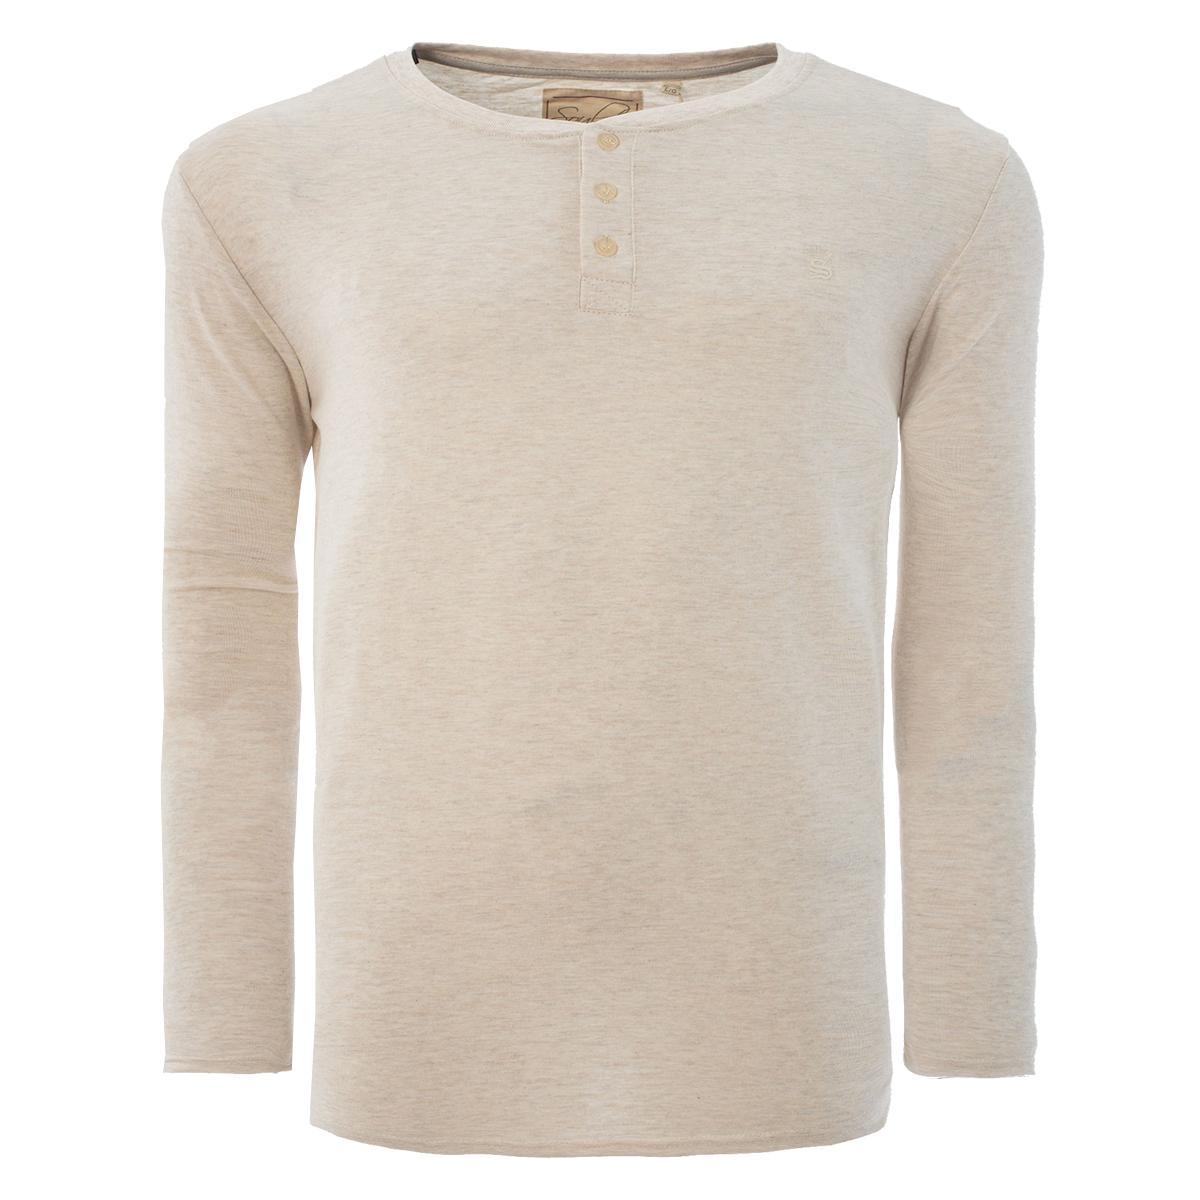 Men-Grandad-T-Shirt-Long-Sleeve-Jersey-Ribbed-Top-Cotton-Rich-Brave-Soul thumbnail 57